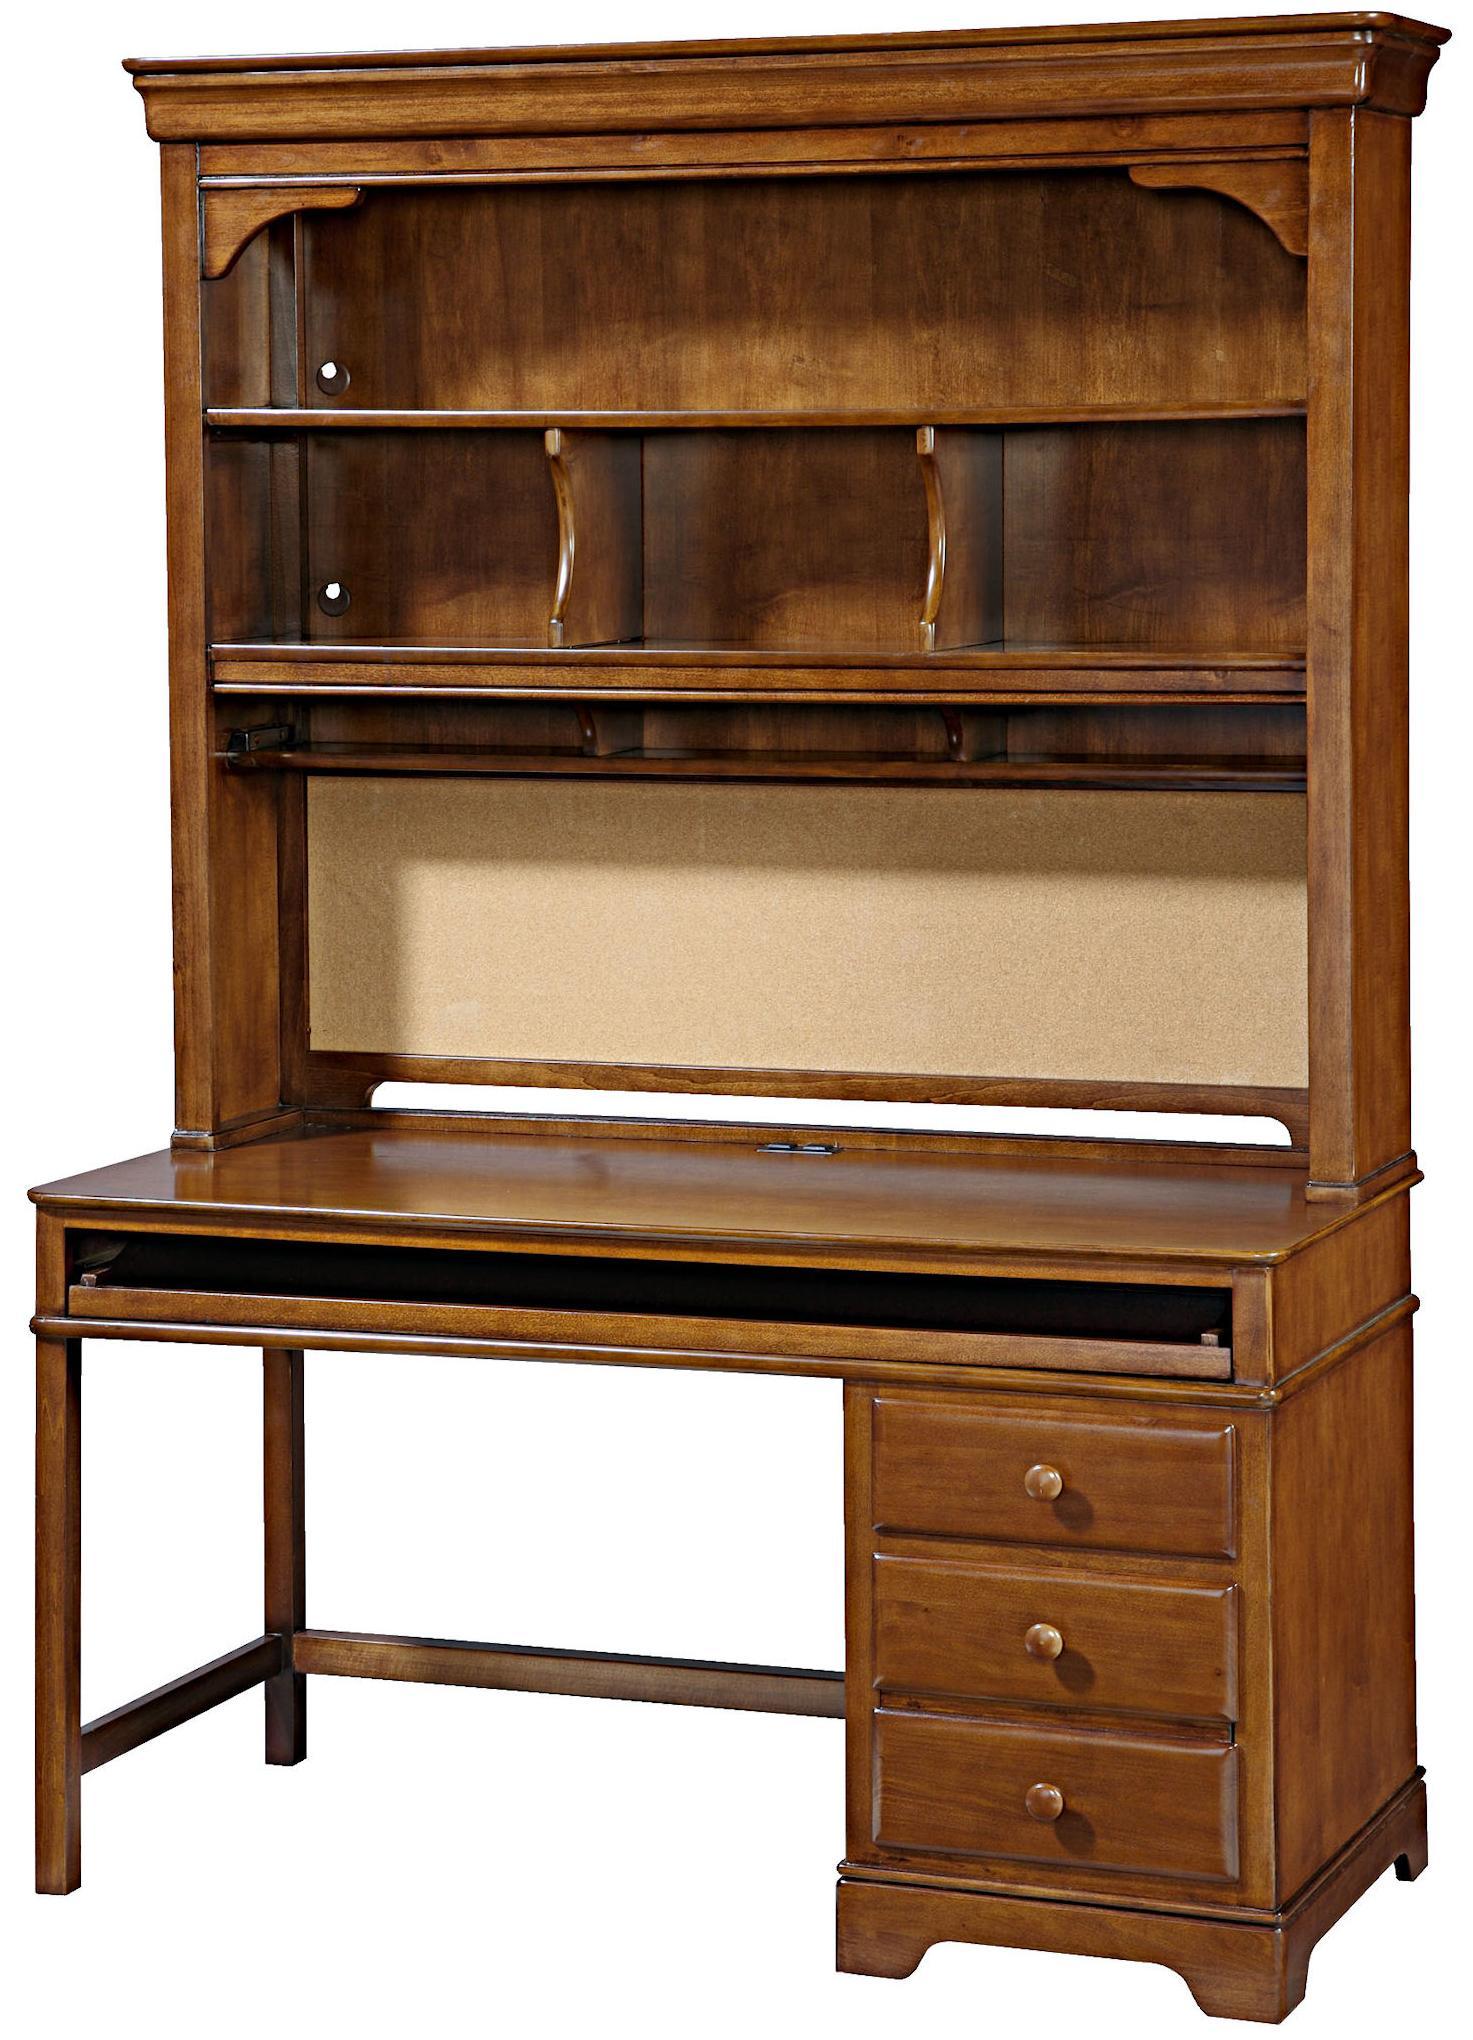 Smartstuff Classics 4.0 Desk with Hutch - Item Number: 1311027+020